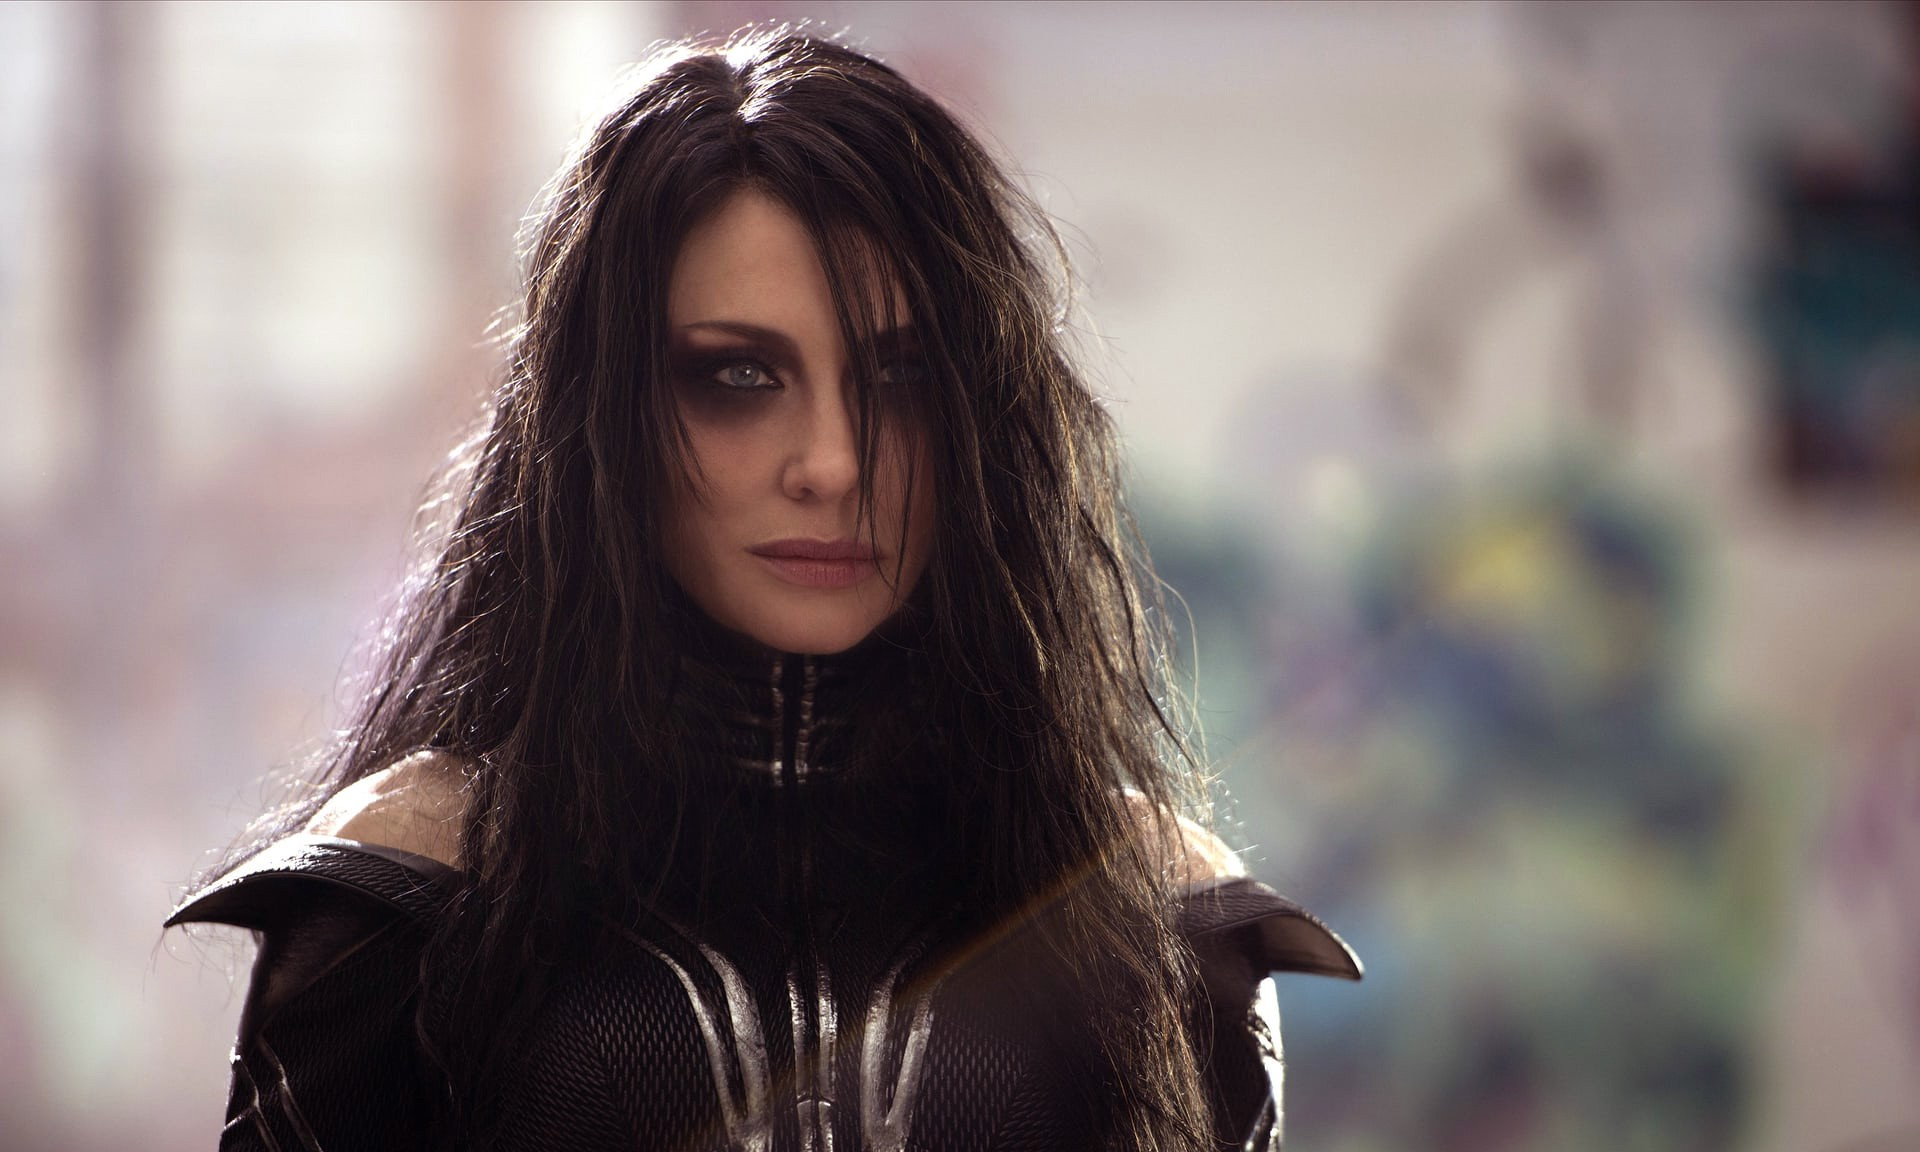 Cate-Blanchett-in-Thor-Ragnarok-1